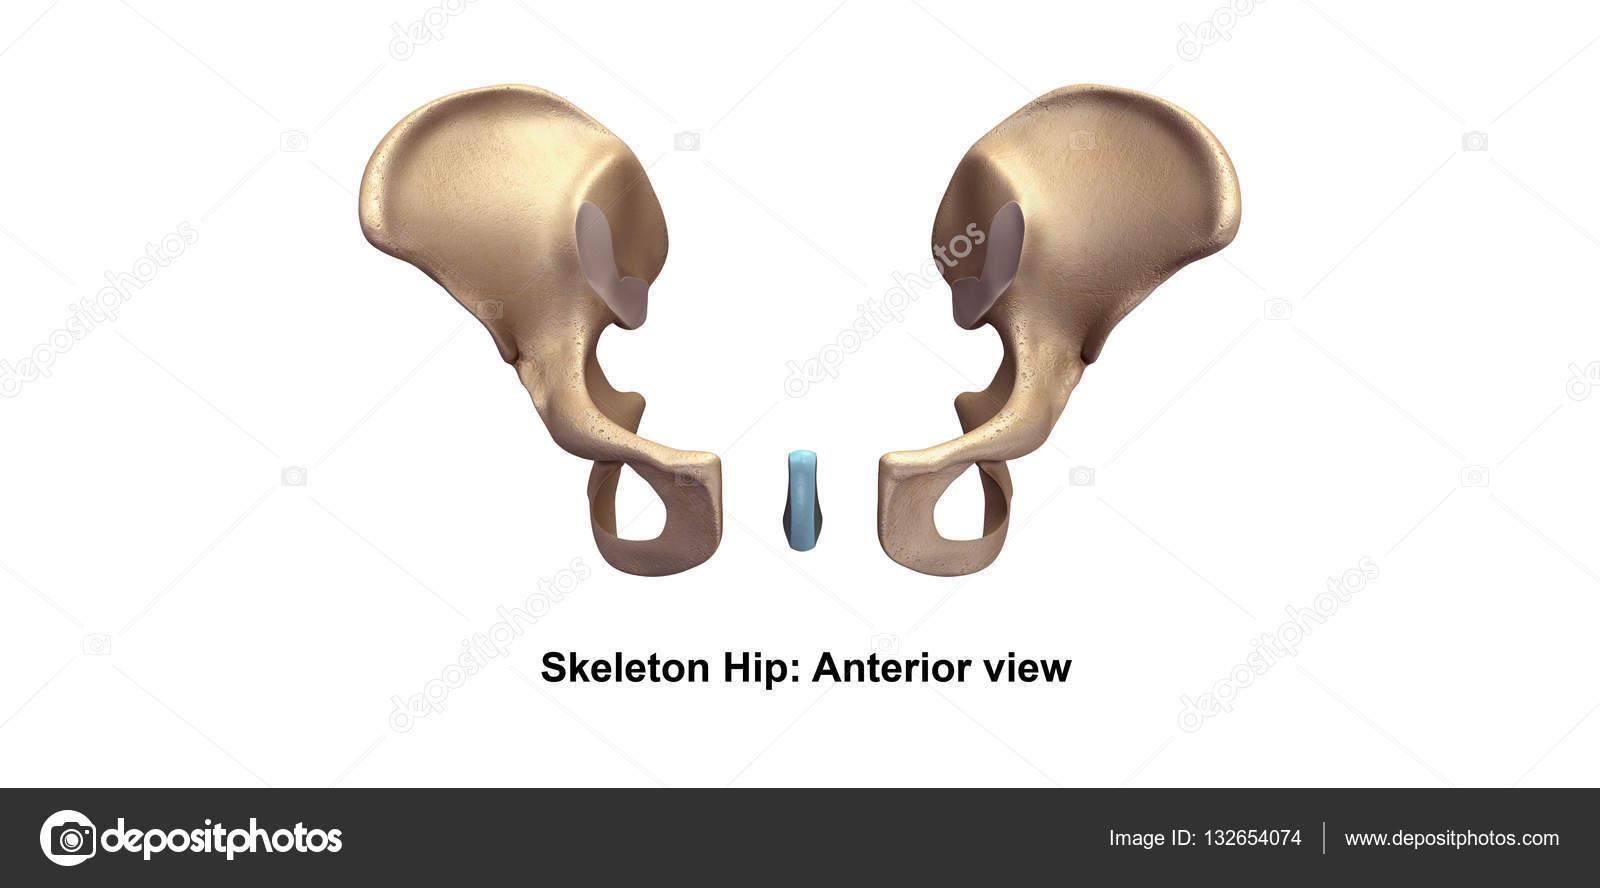 Skeleton hip illustration — Stock Photo © sciencepics #132654074